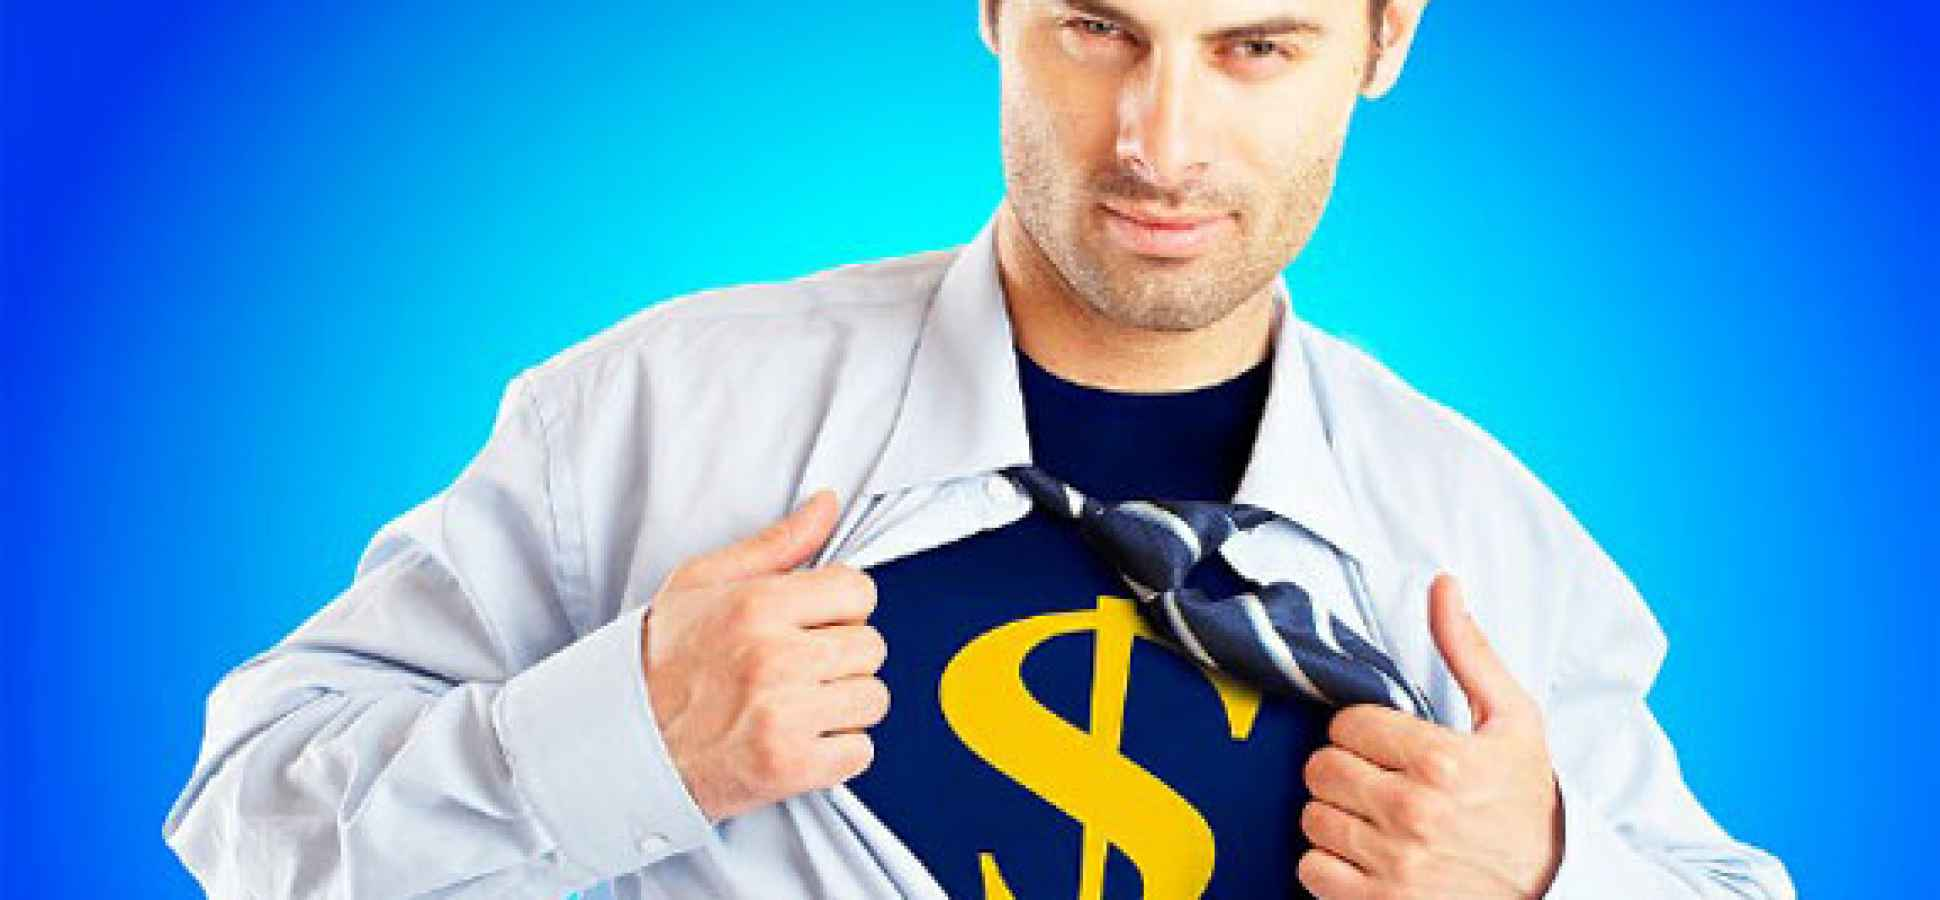 4 Traits of Sales Superheros